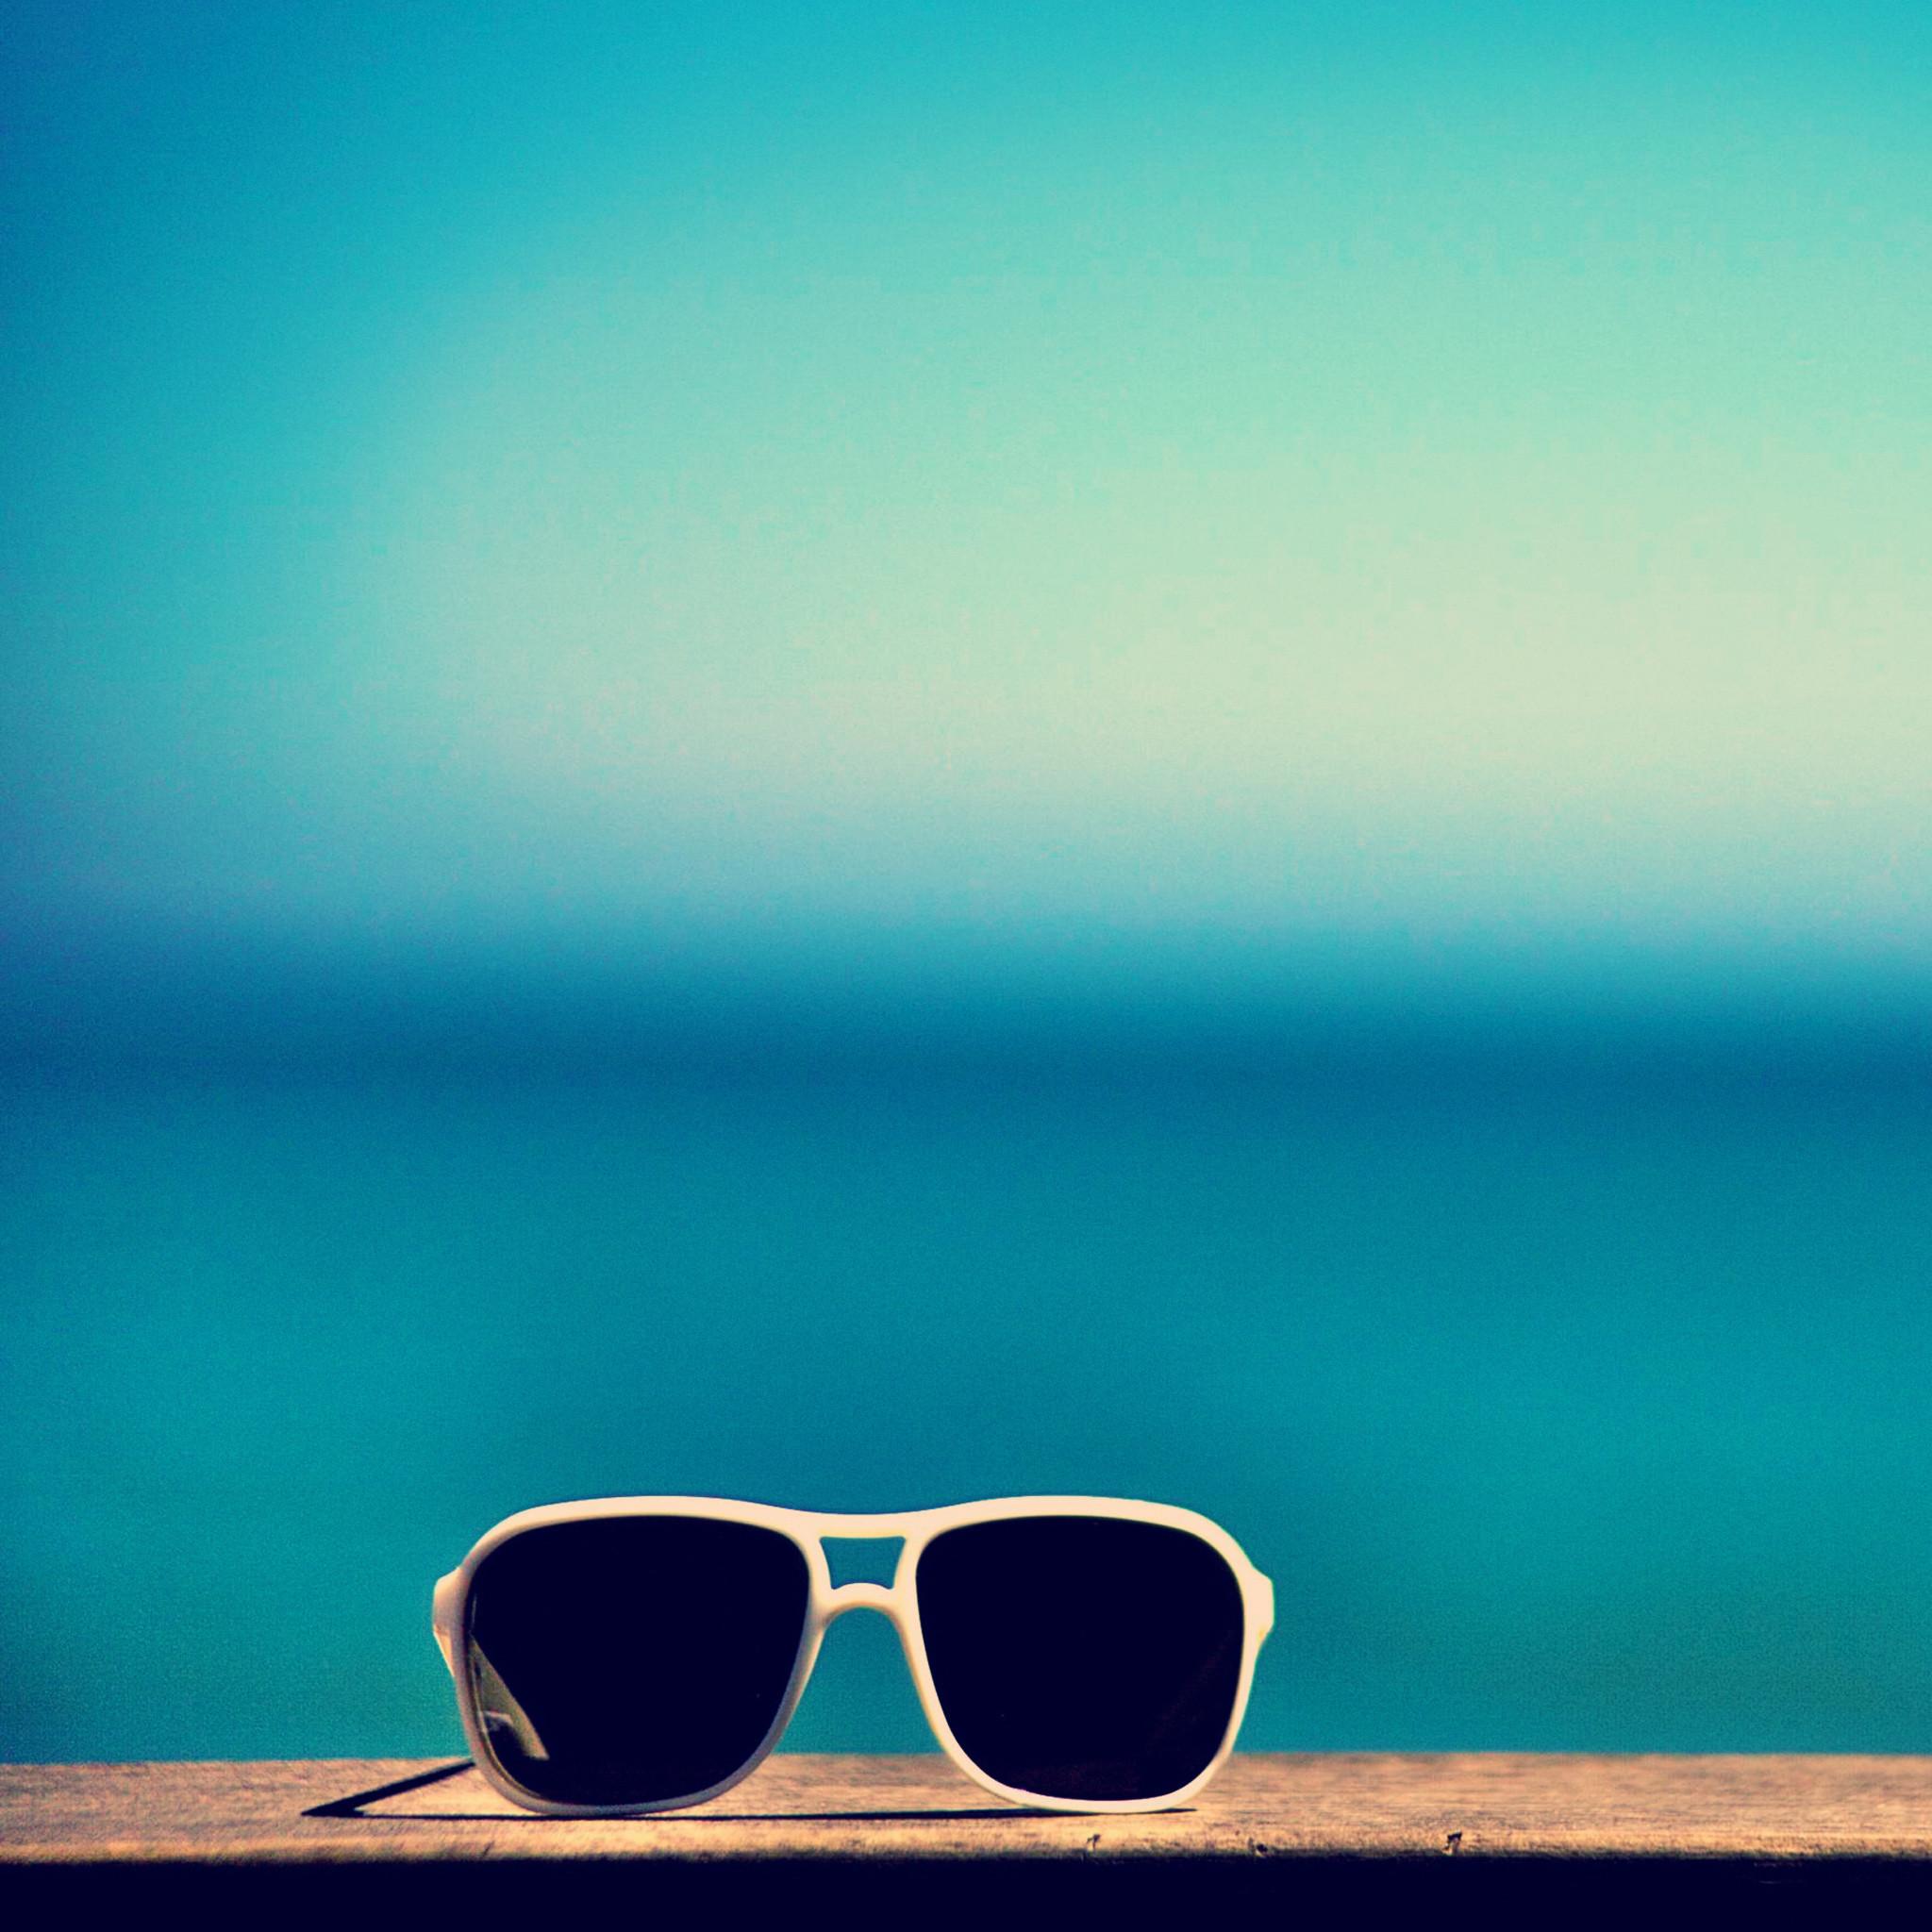 #Summer will be waiting…The #iPad Retina #Wallpaper I just